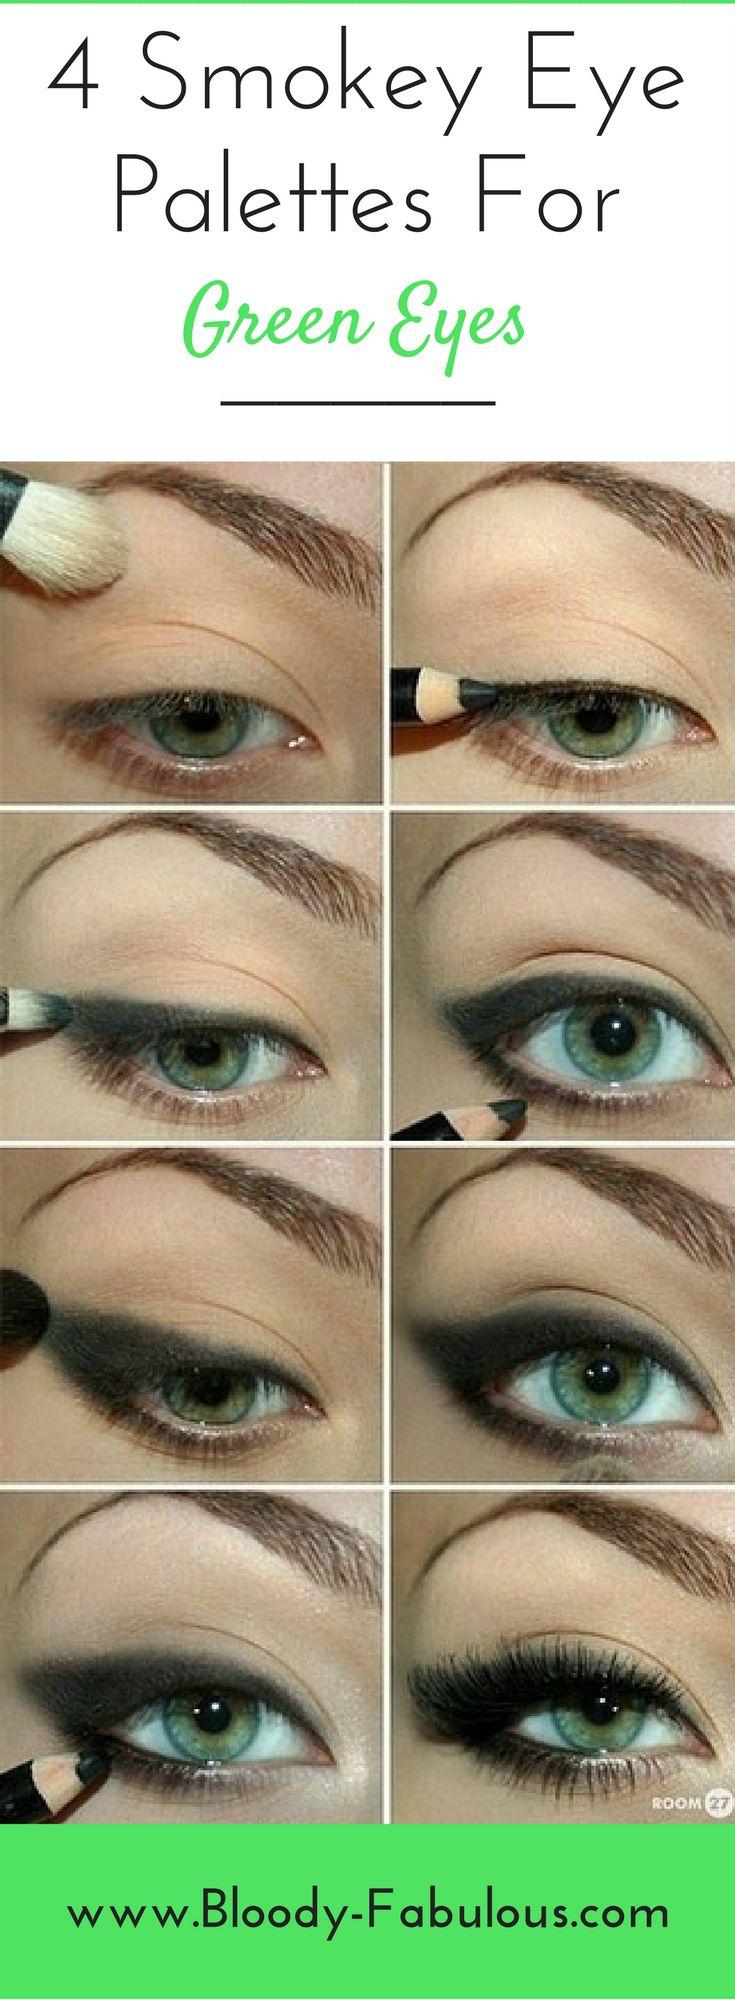 The best smokey eye palette's & tips for green eyes!